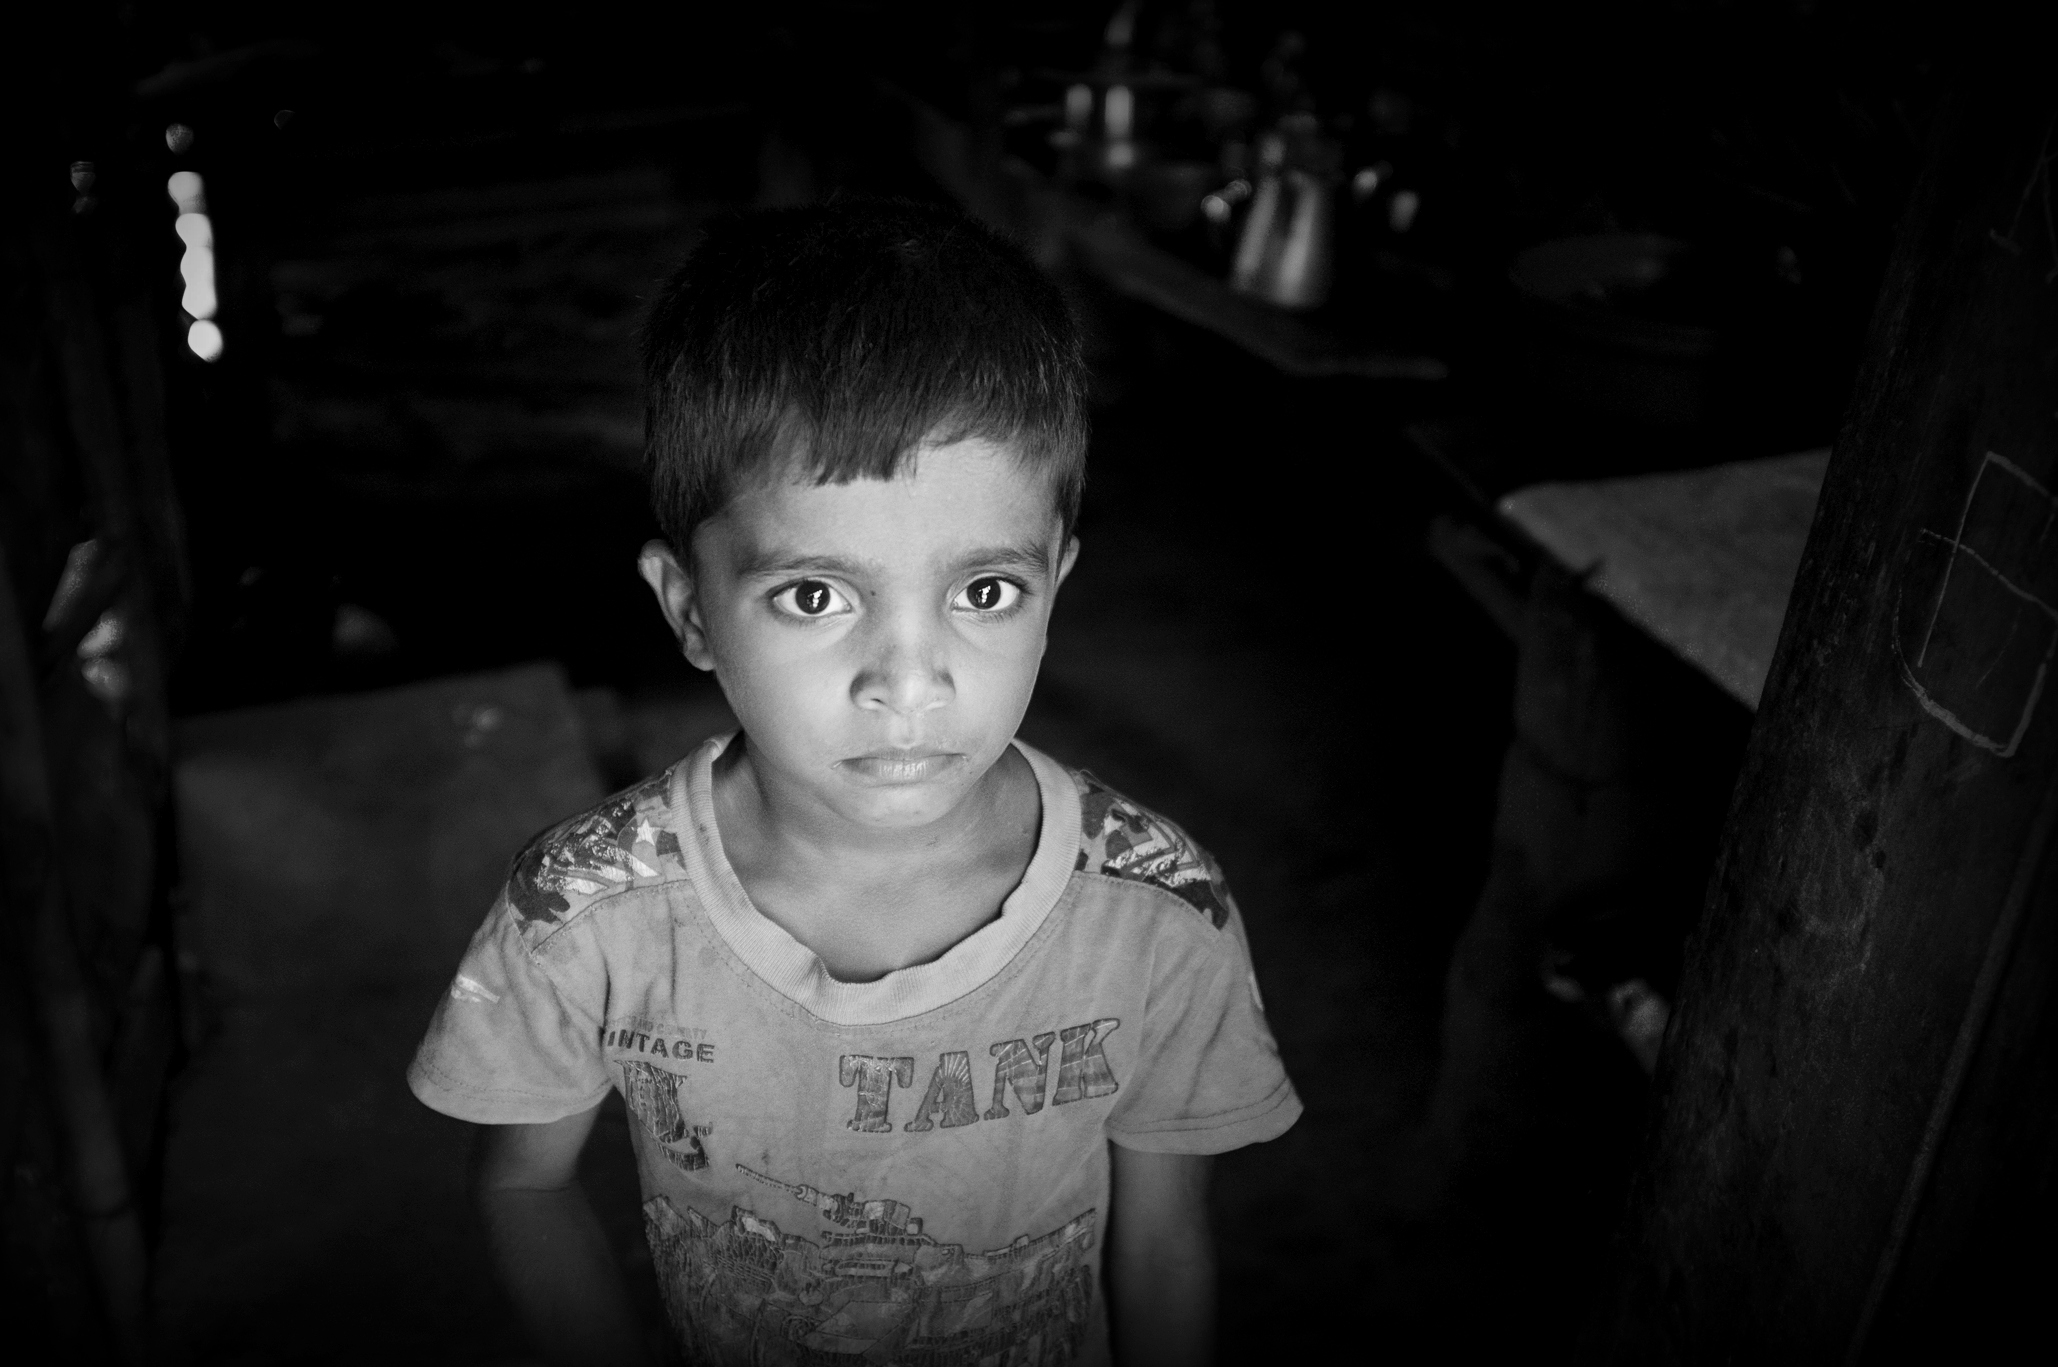 Sri-Lanka-village-boy-BW_REEDIT copy.jpg